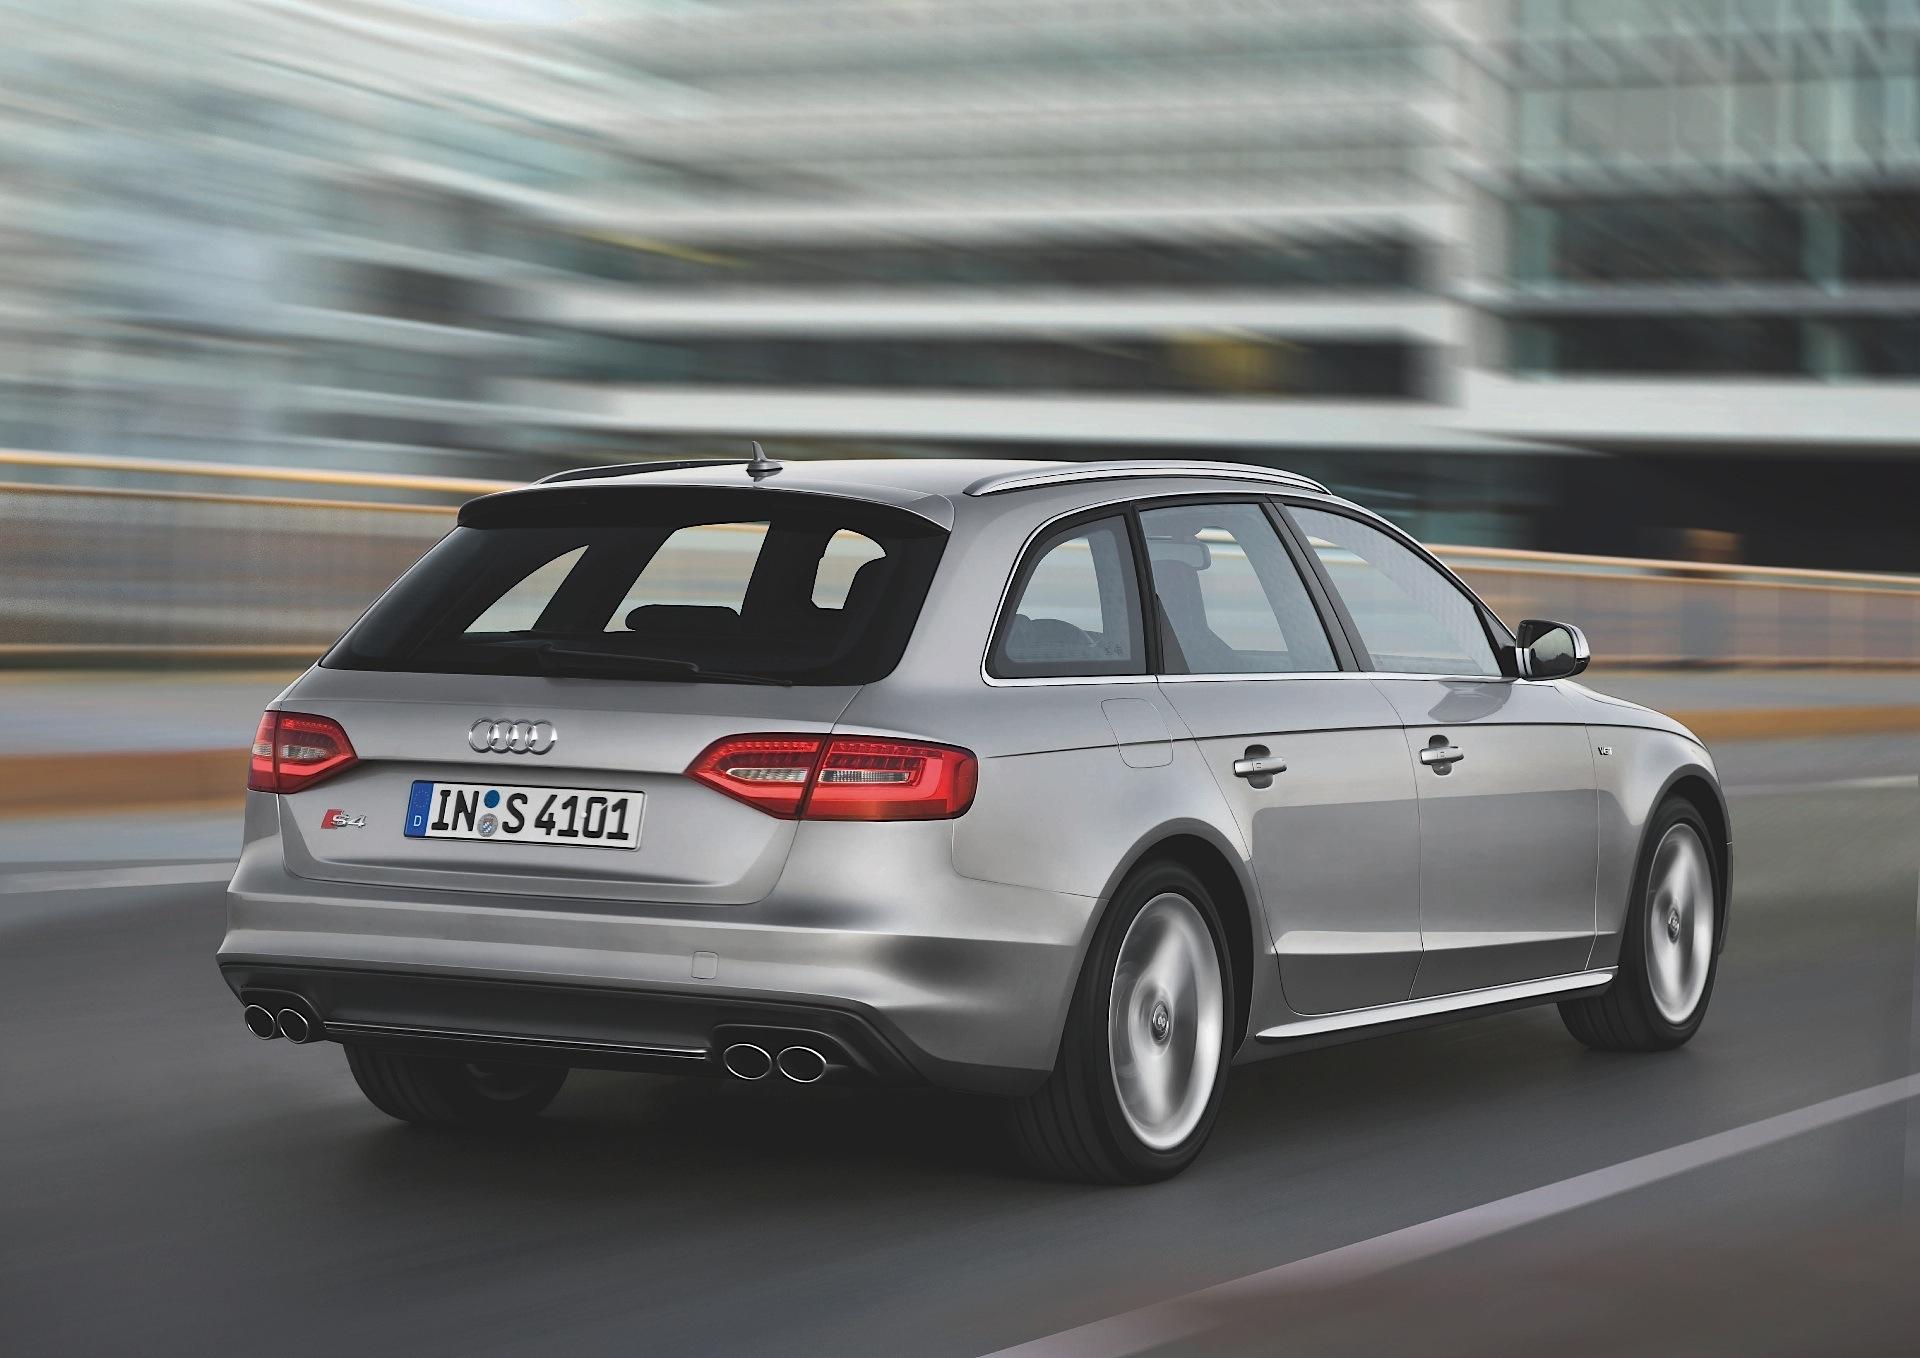 AUDI S Avant Specs - Audi s4 avant